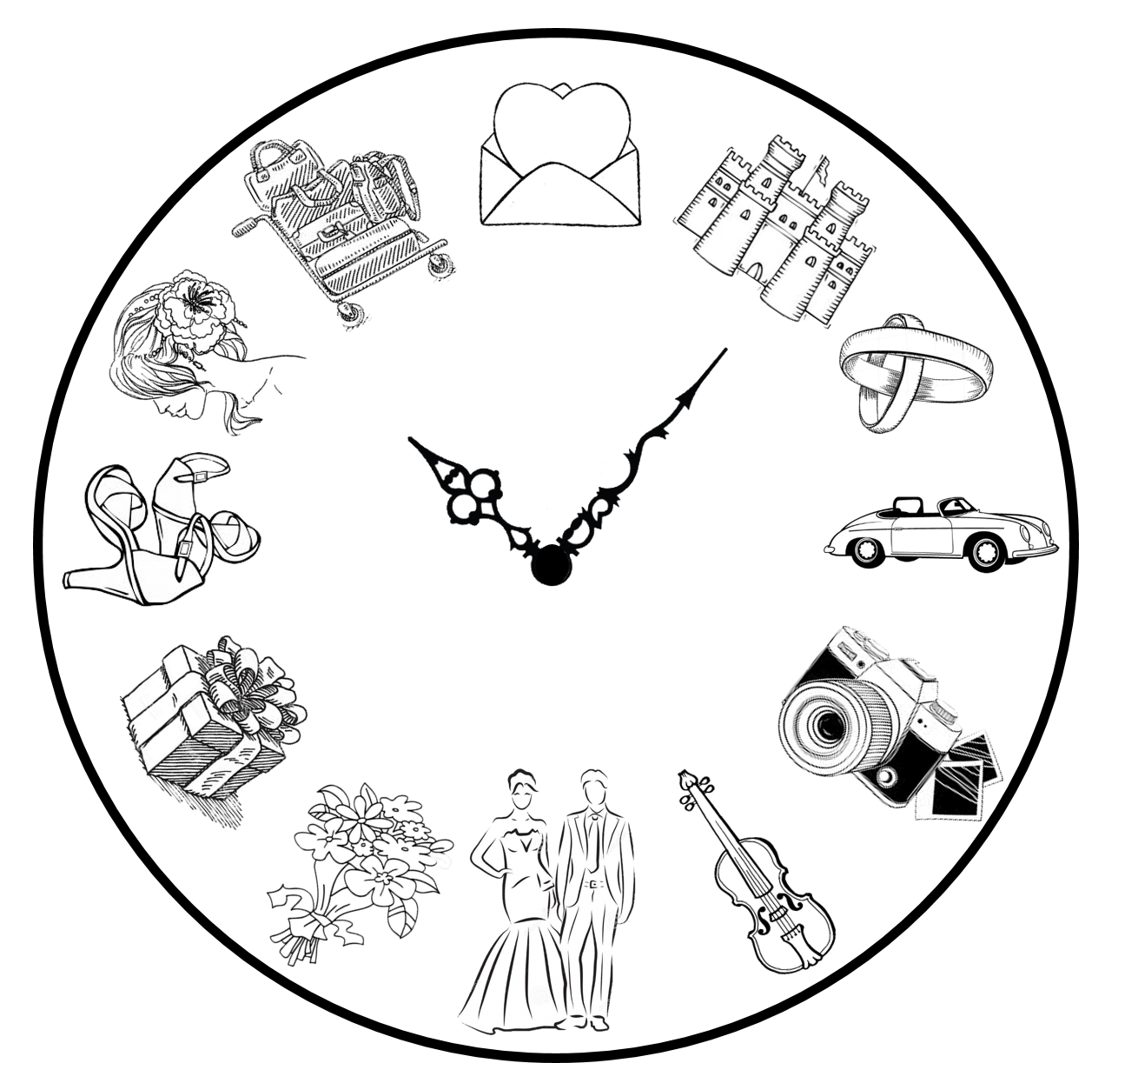 Bomboniere Matrimonio Quanto Tempo Prima.Quanto Tempo Prima Si Organizza Il Matrimonio Annalisa Wedding